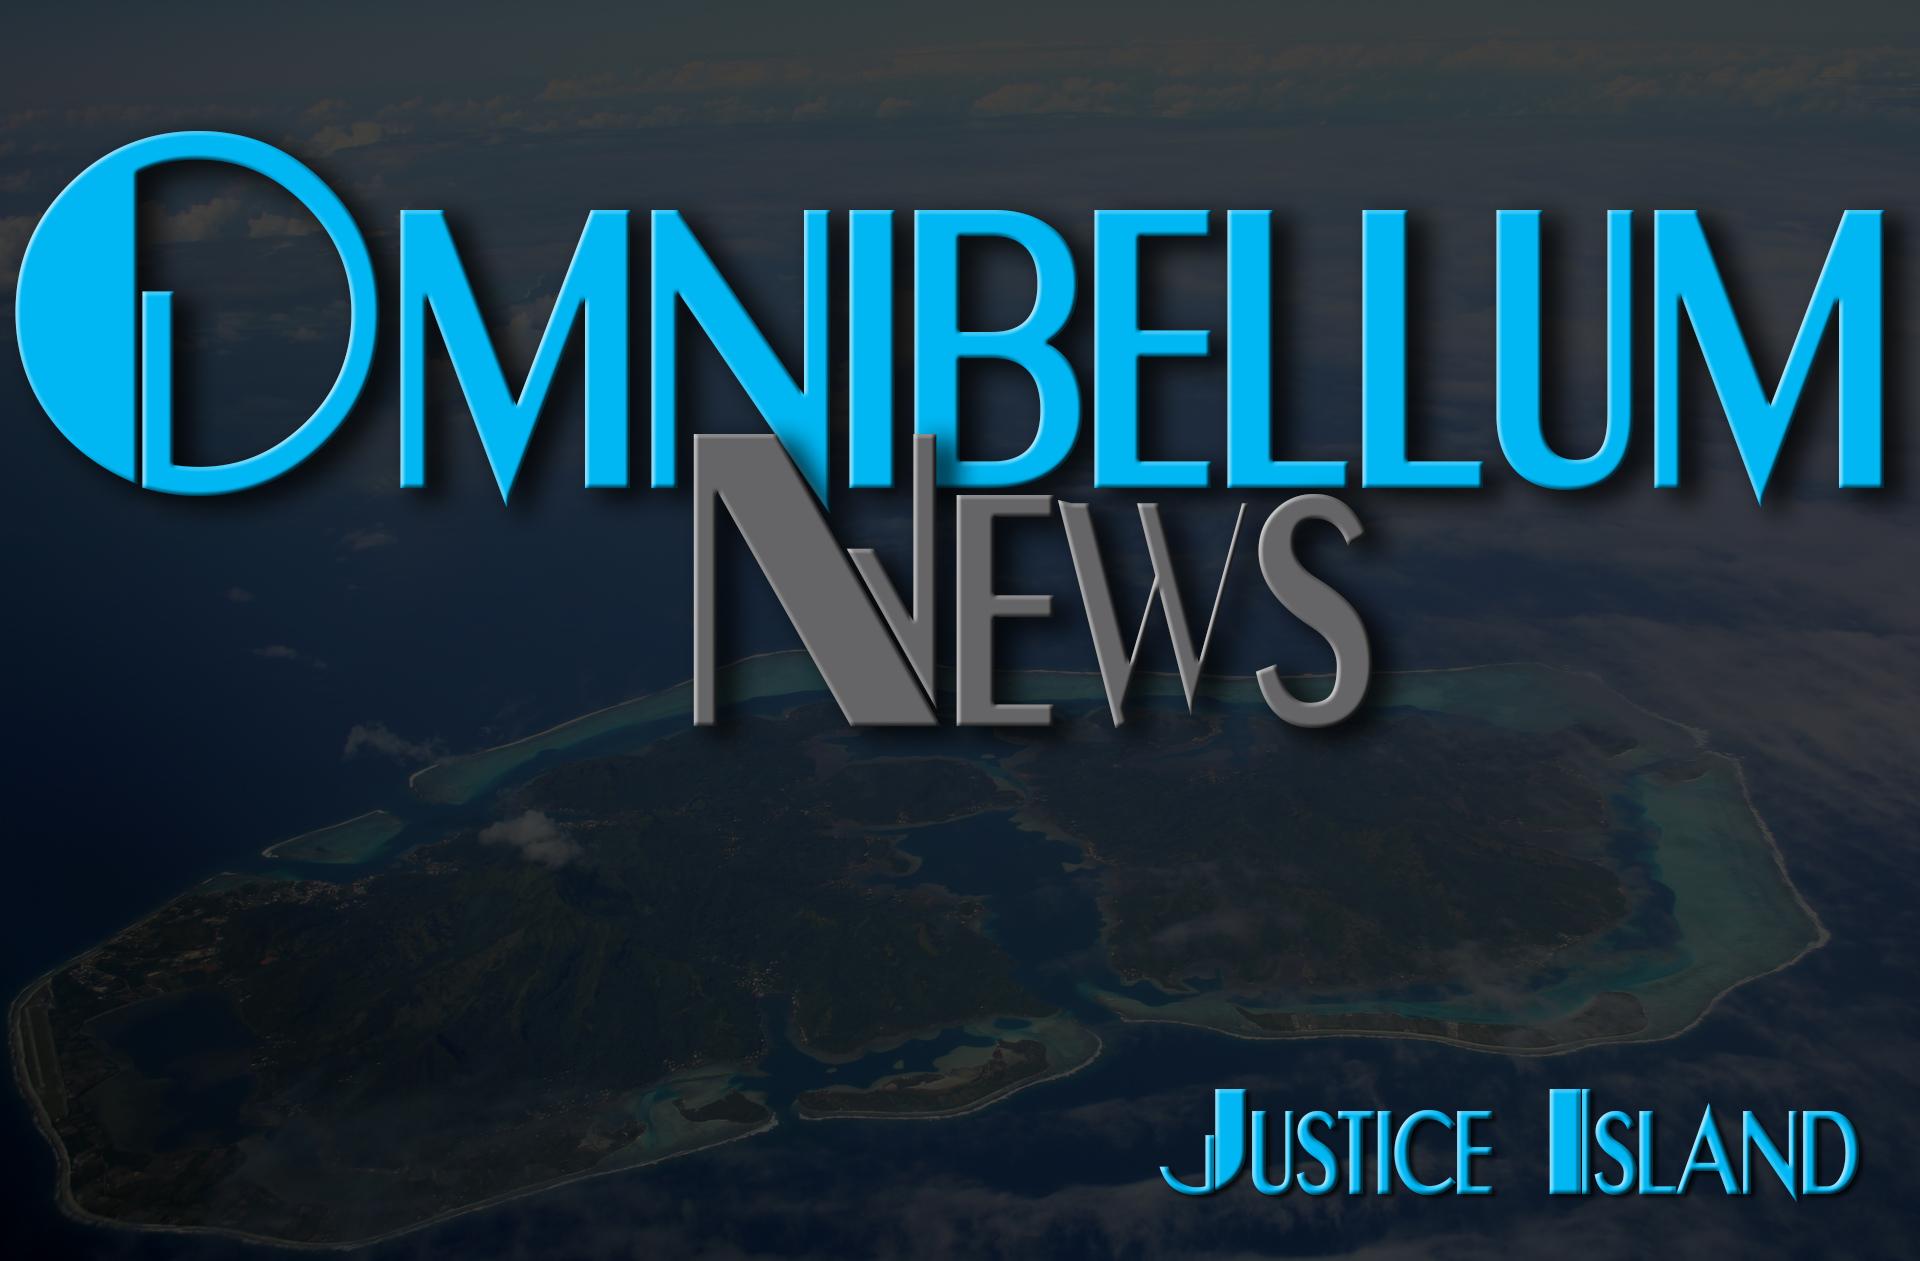 OmnibellumNewsBlue